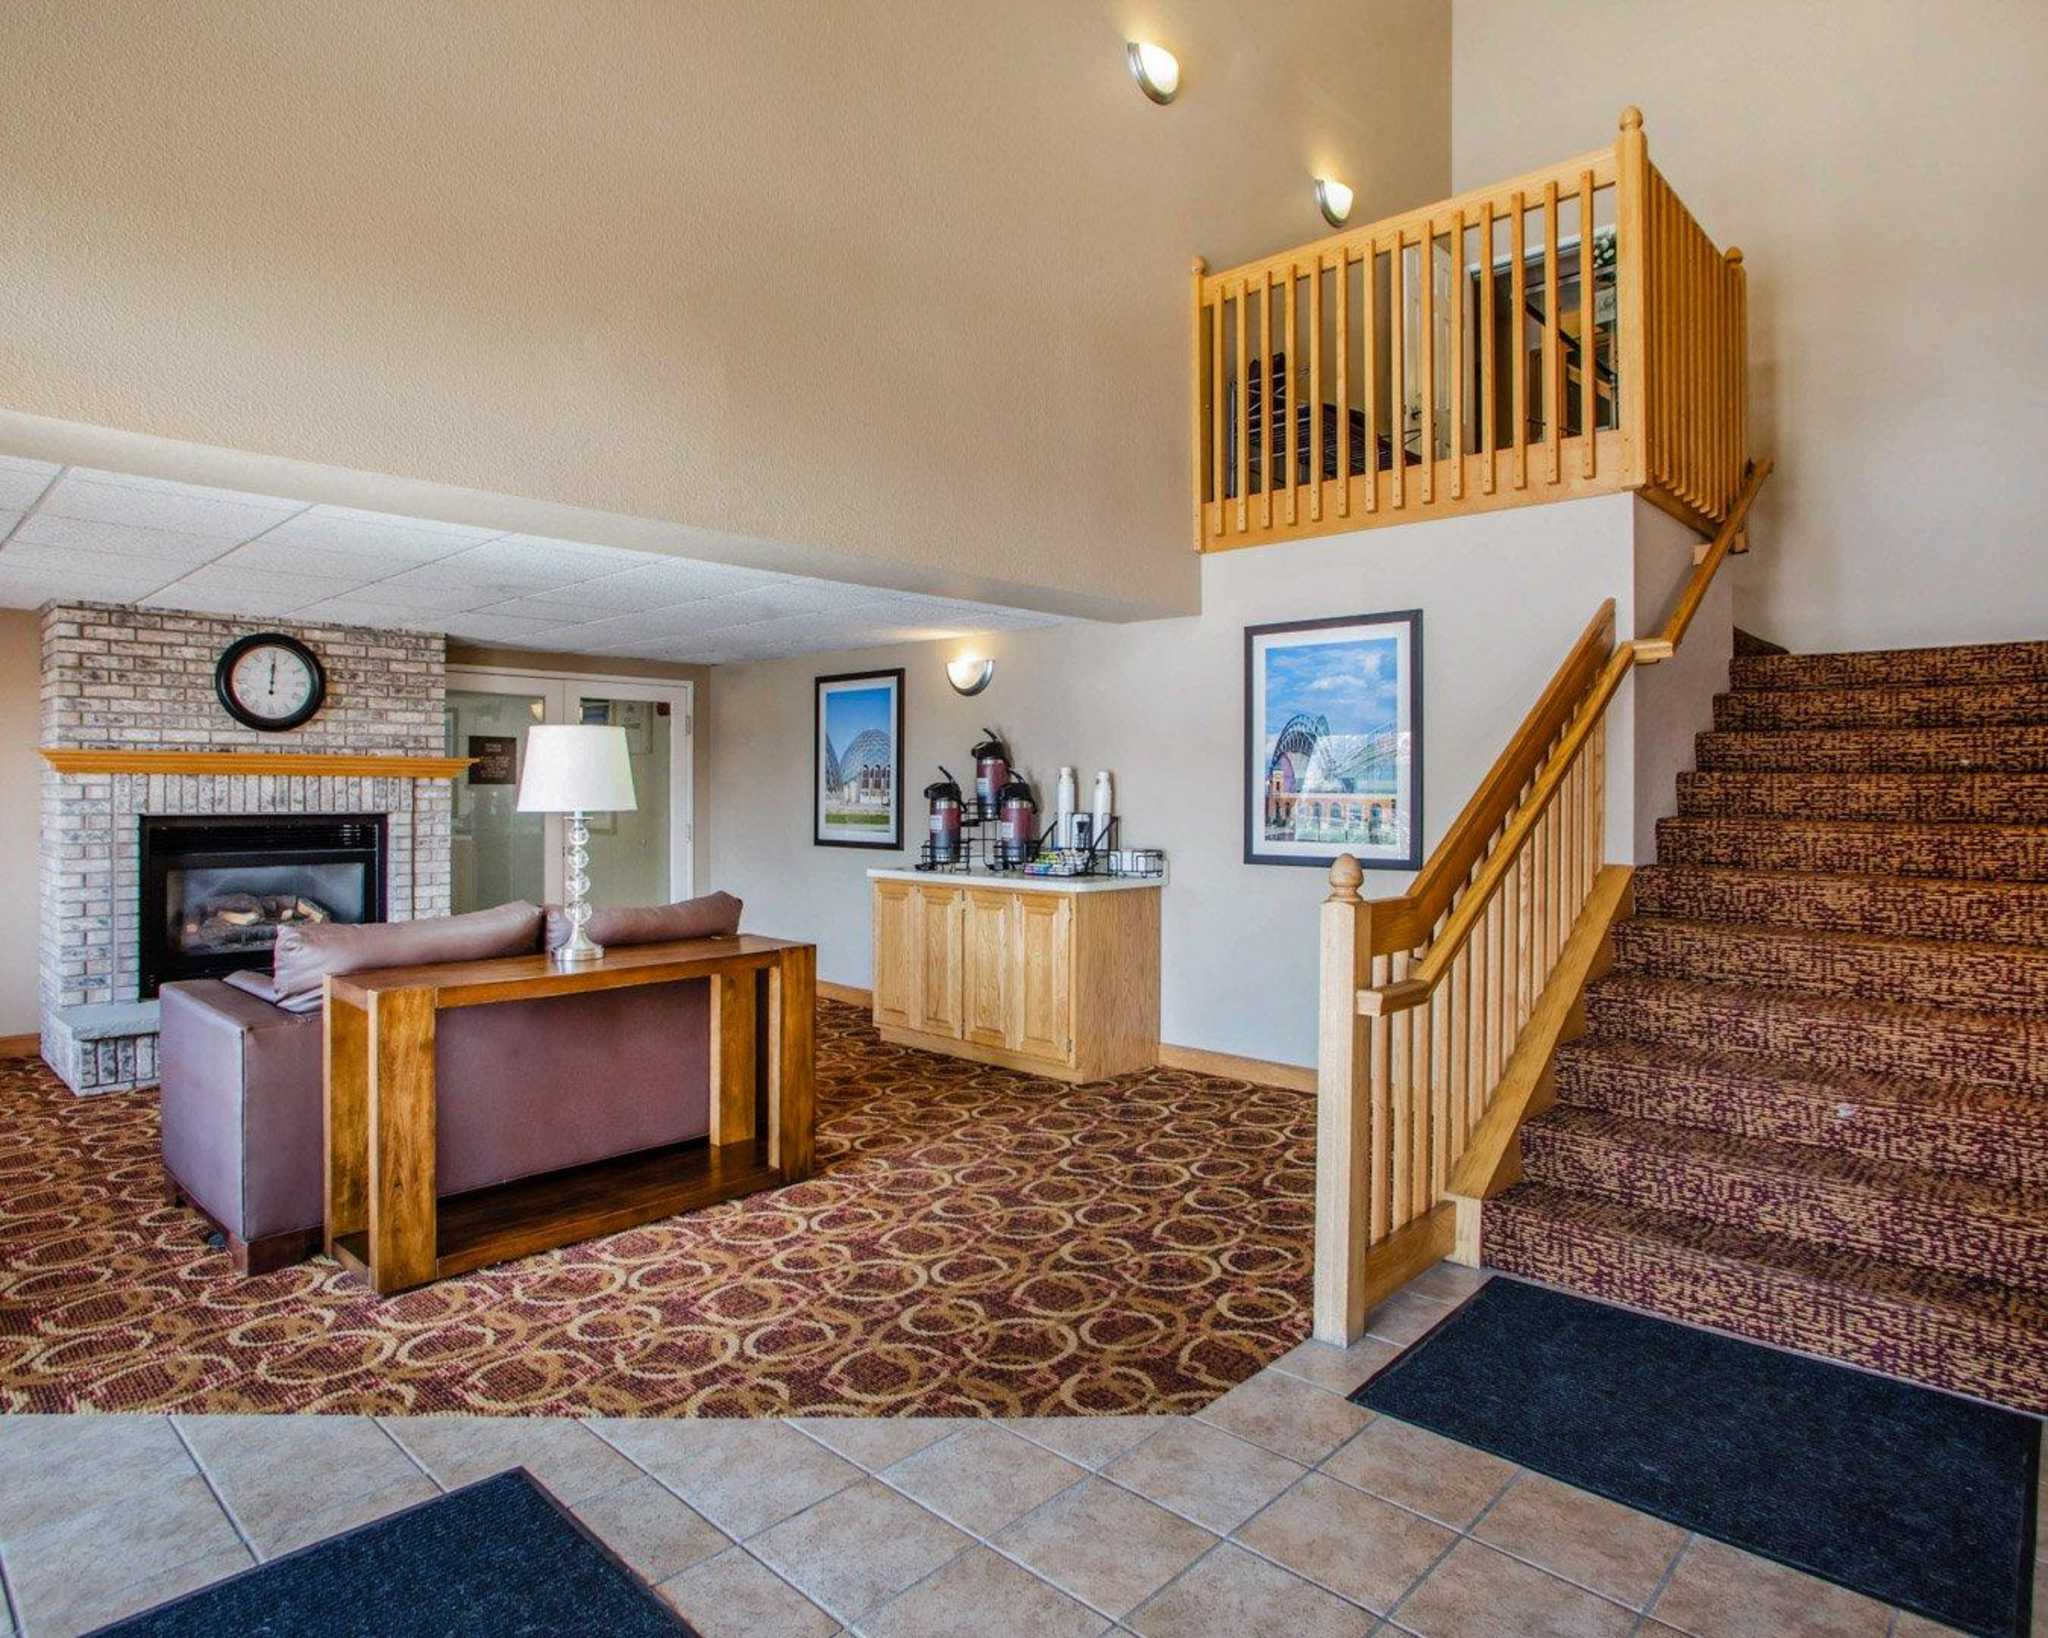 Comfort Inn & Suites Jackson - West Bend image 19